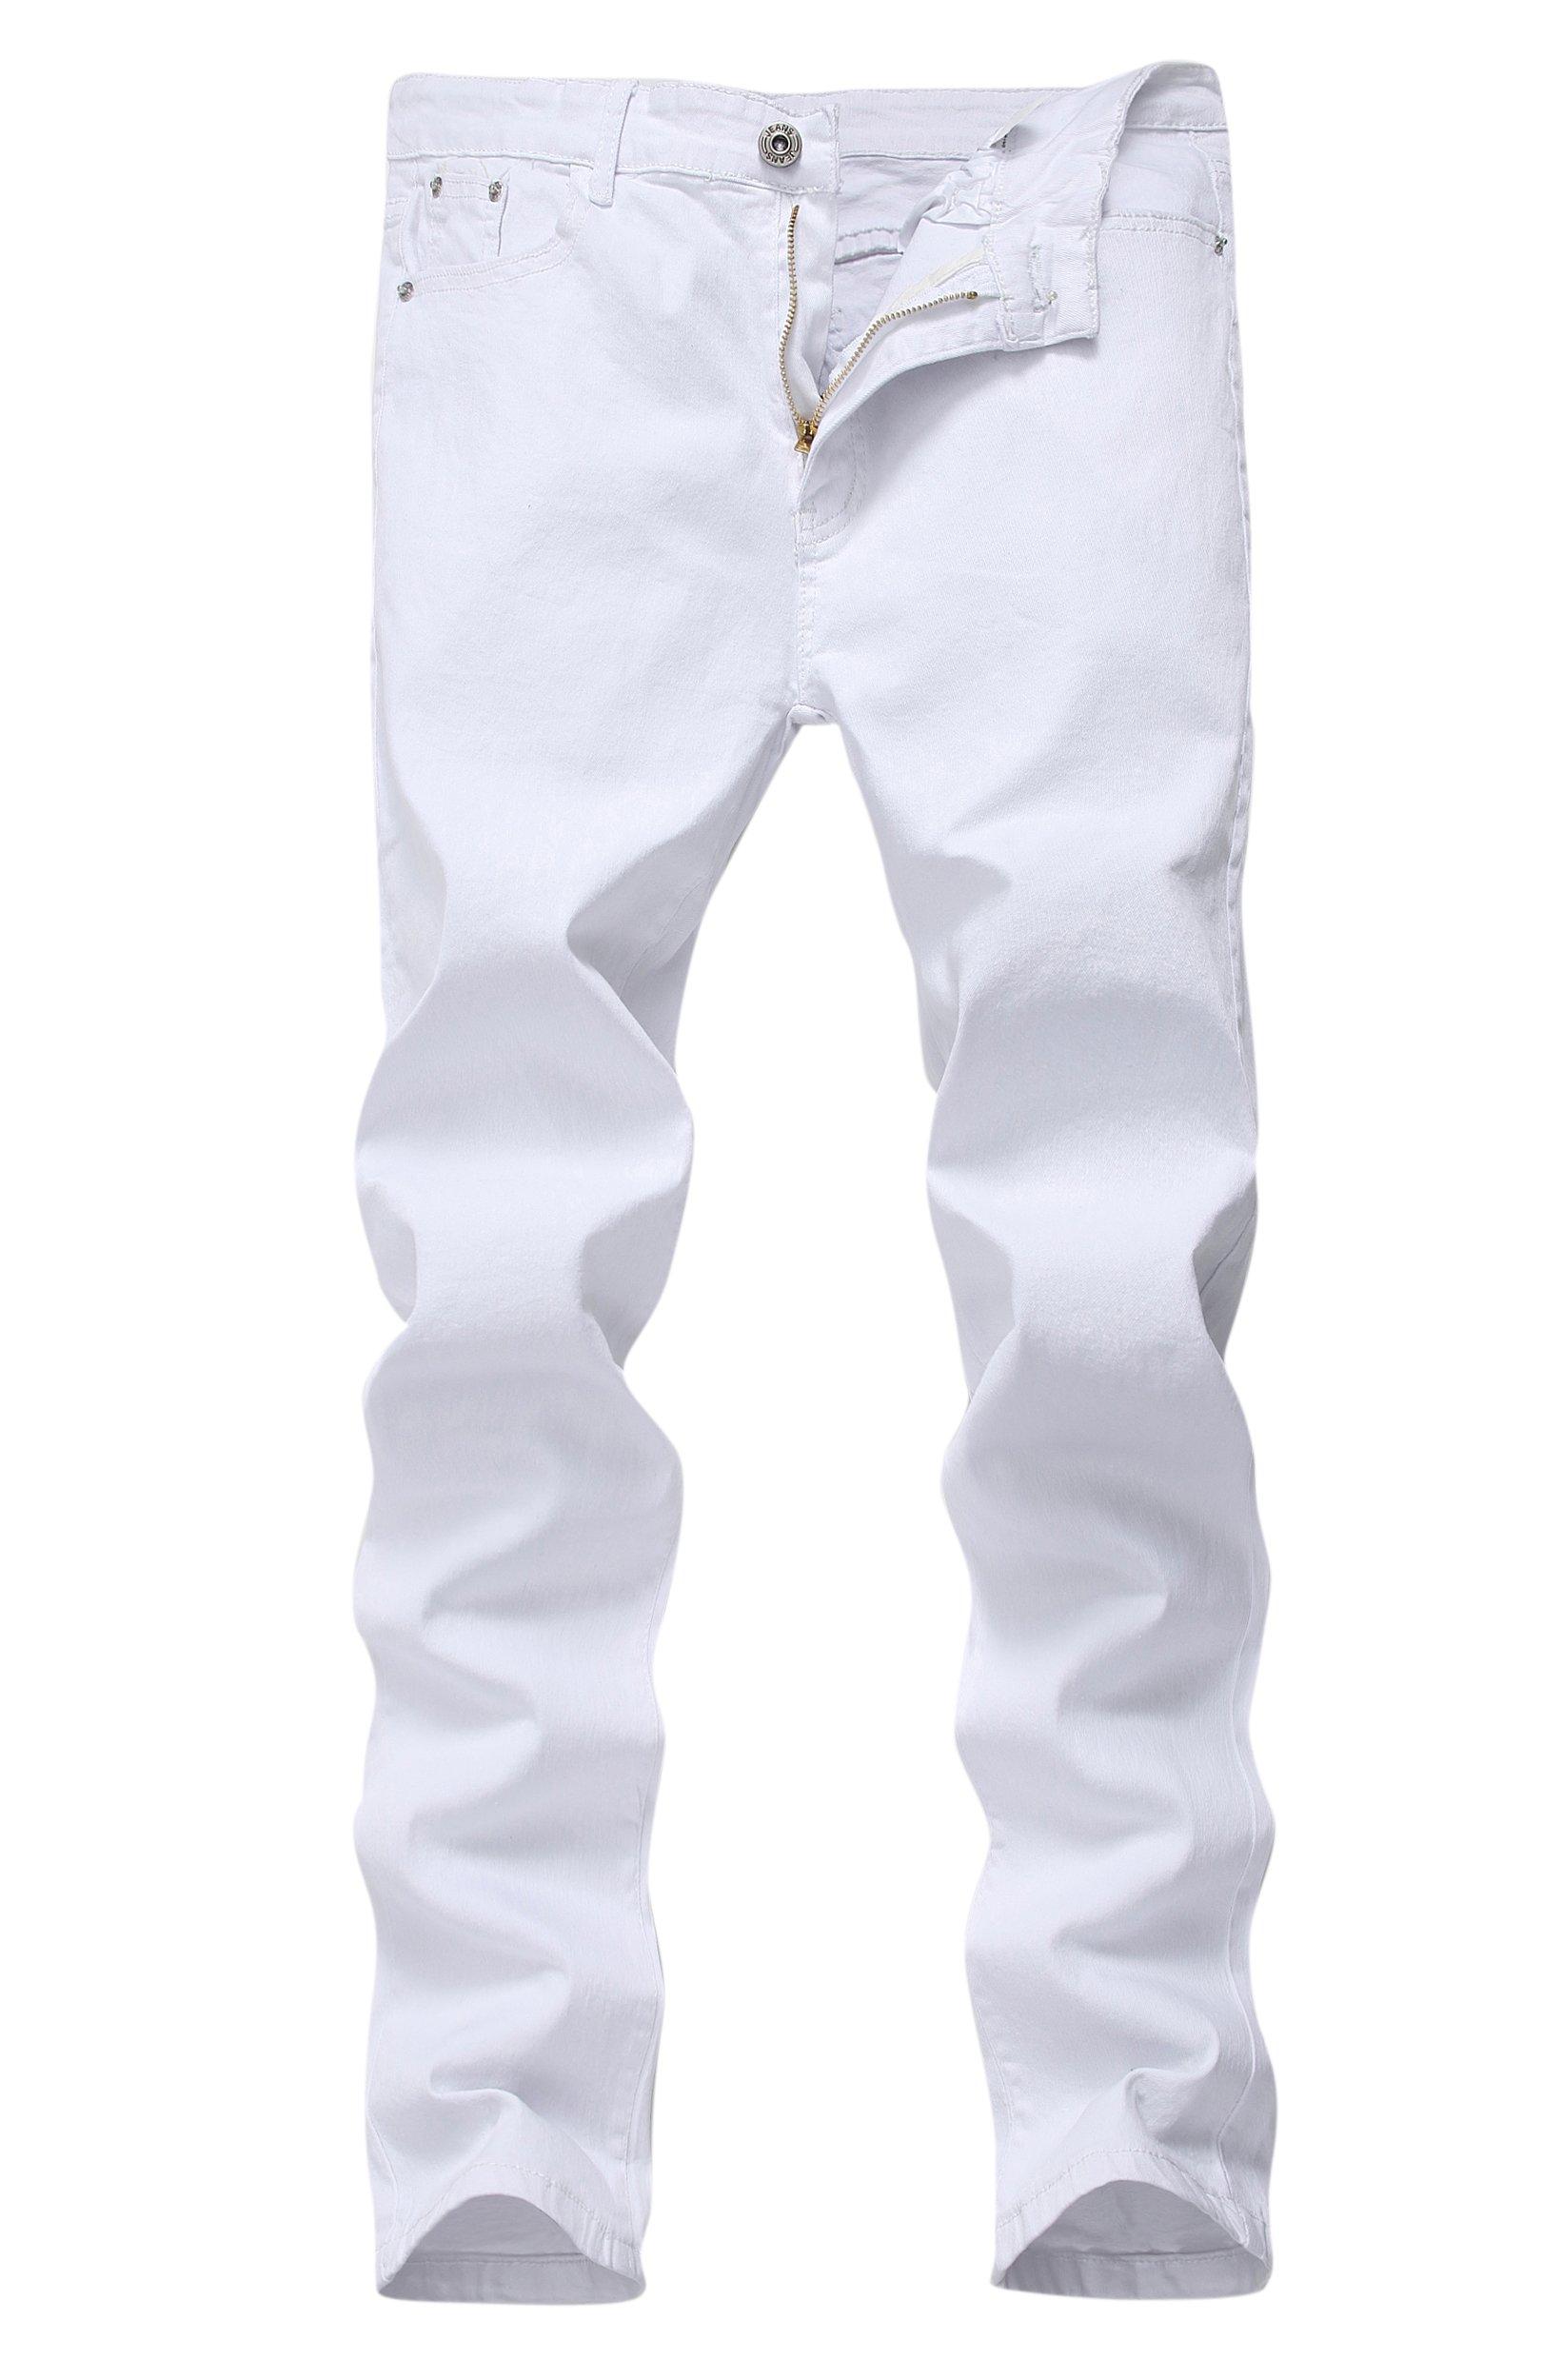 8973036d934e Men's Skinny Slim Fit Stretch Straight Leg Fashion Jeans Pants ...